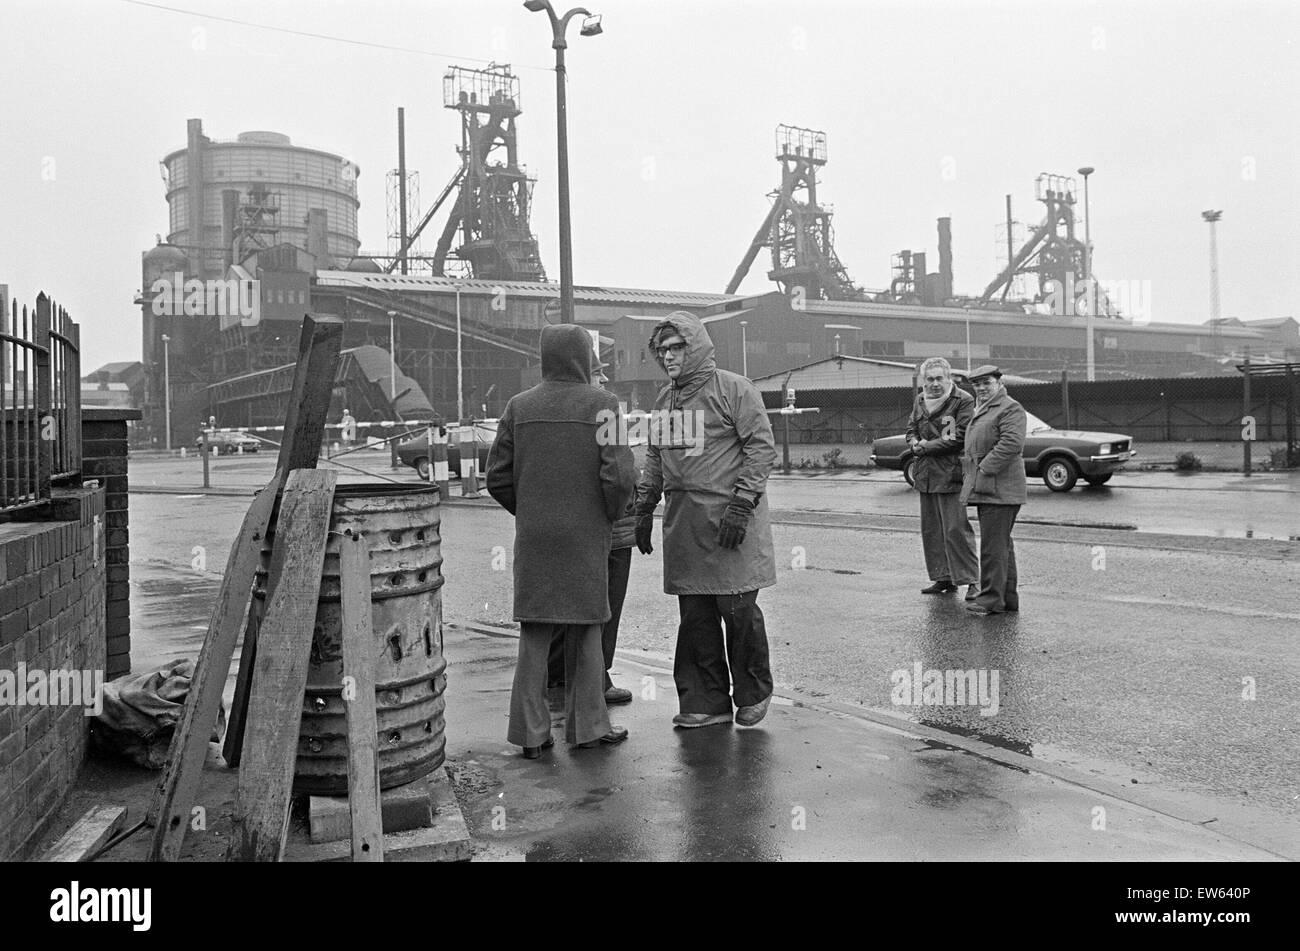 1980 Steel Strike, Shutdown, British Steel Corporation, North Yorkshire, Thursday 3rd January 1980. - Stock Image